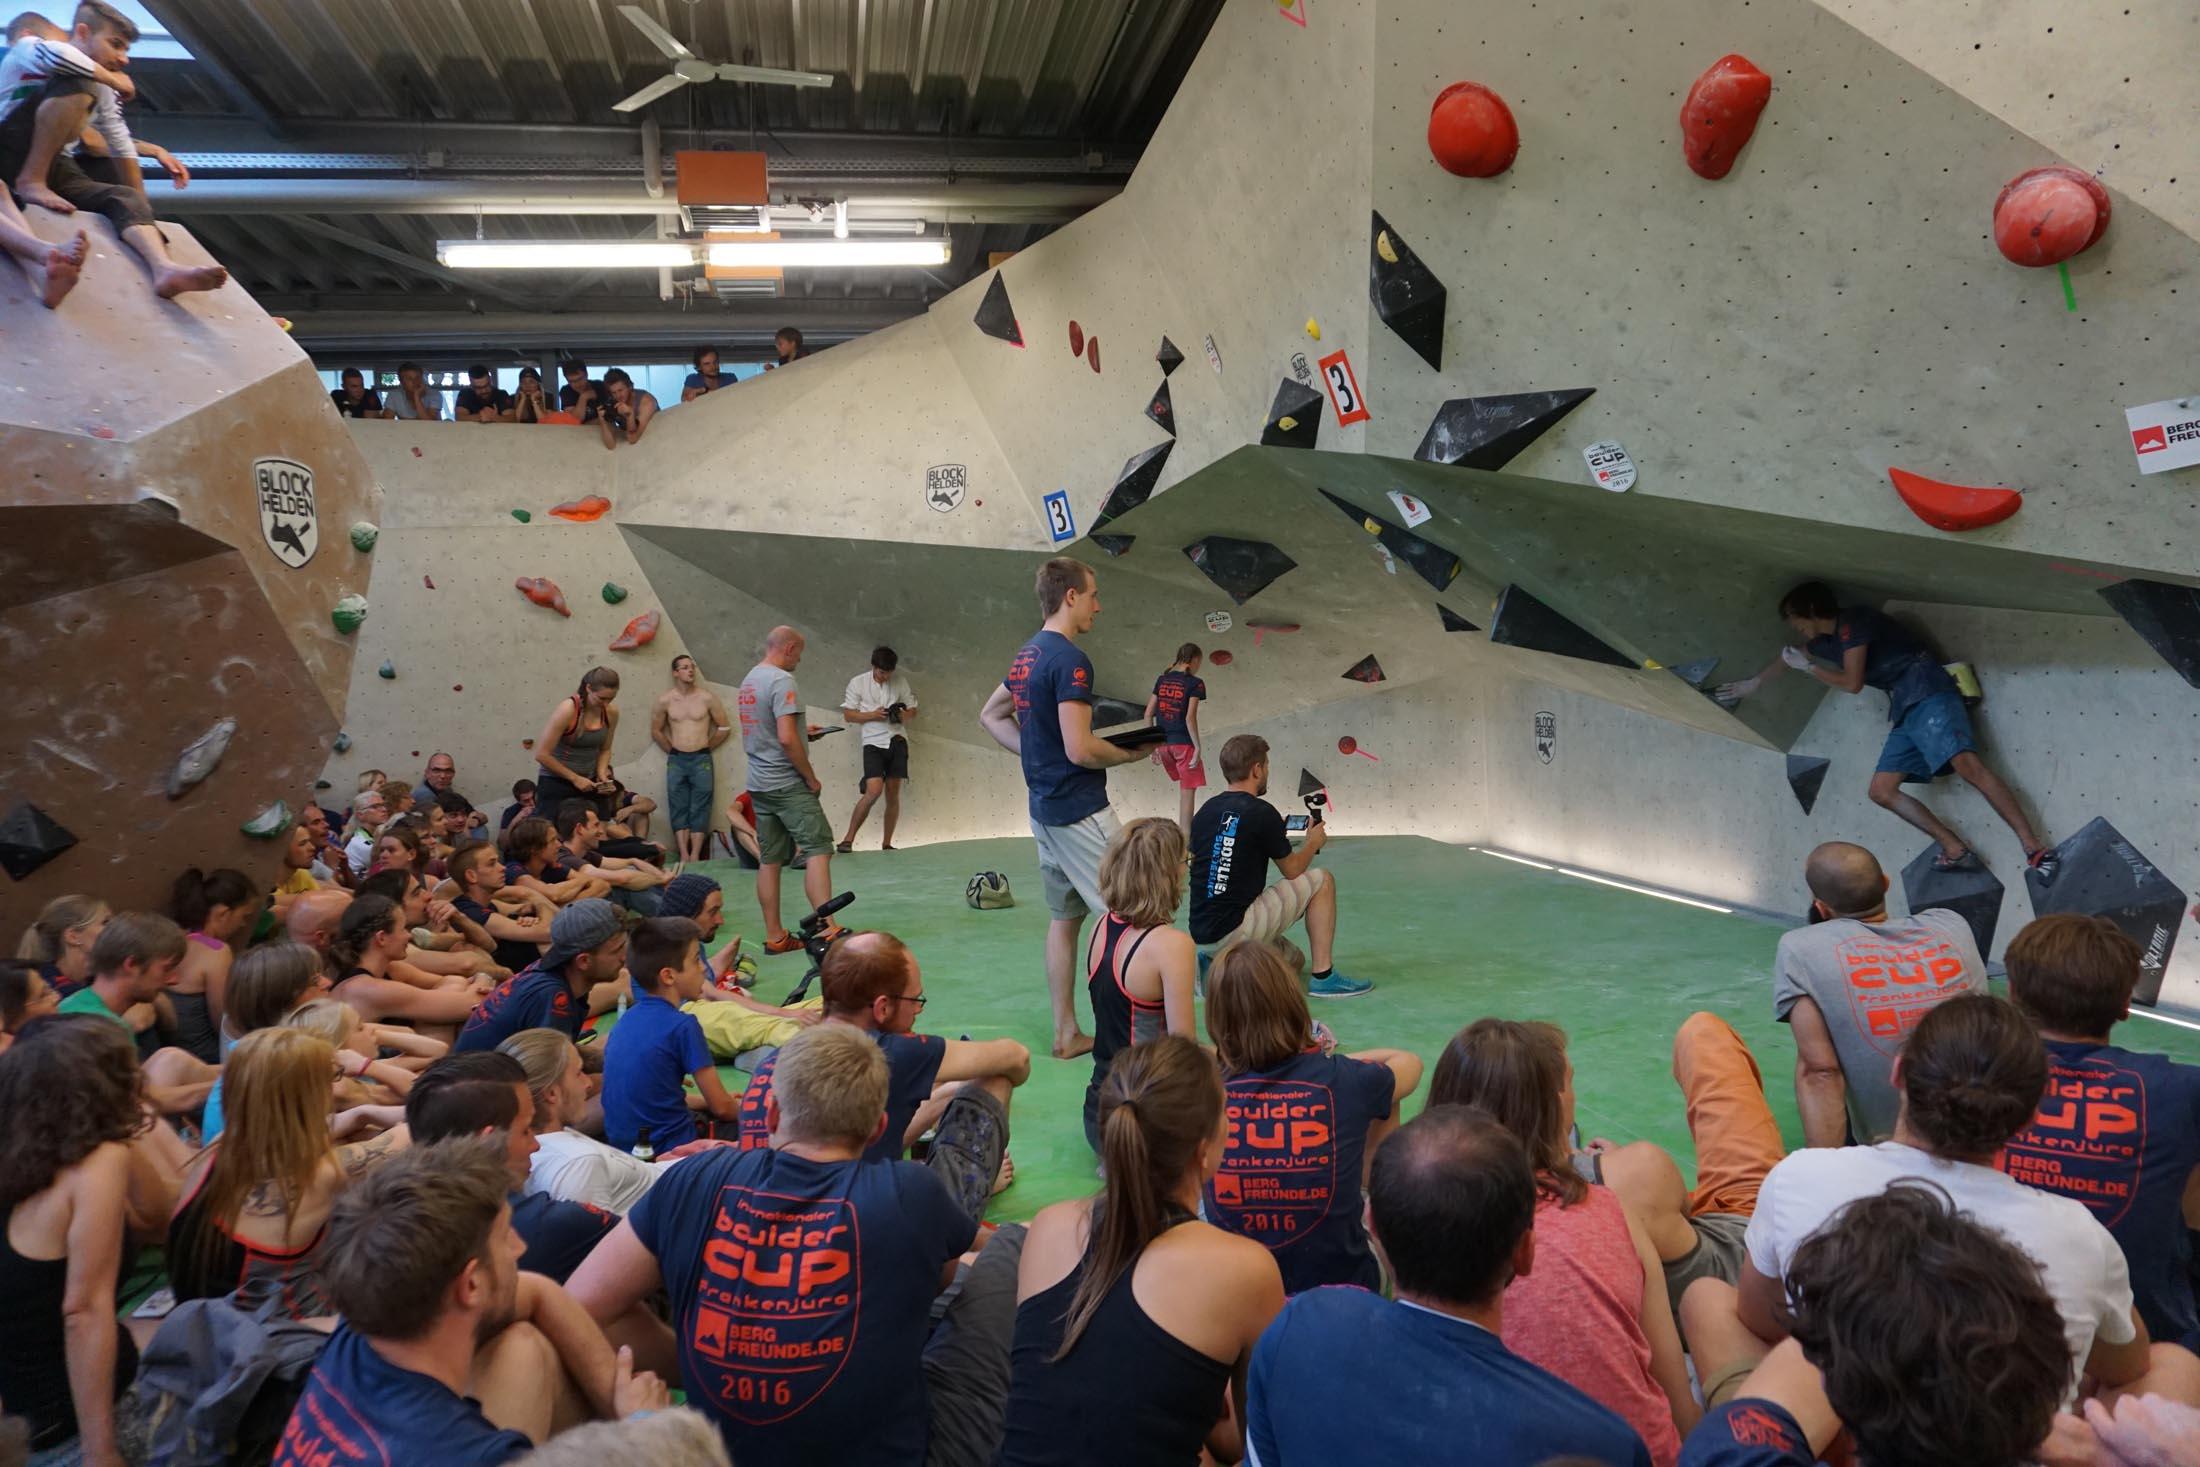 Finale, internationaler bouldercup Frankenjura 2016, BLOCKHELDEN Erlangen, Mammut, Bergfreunde.de, Boulderwettkampf07092016708